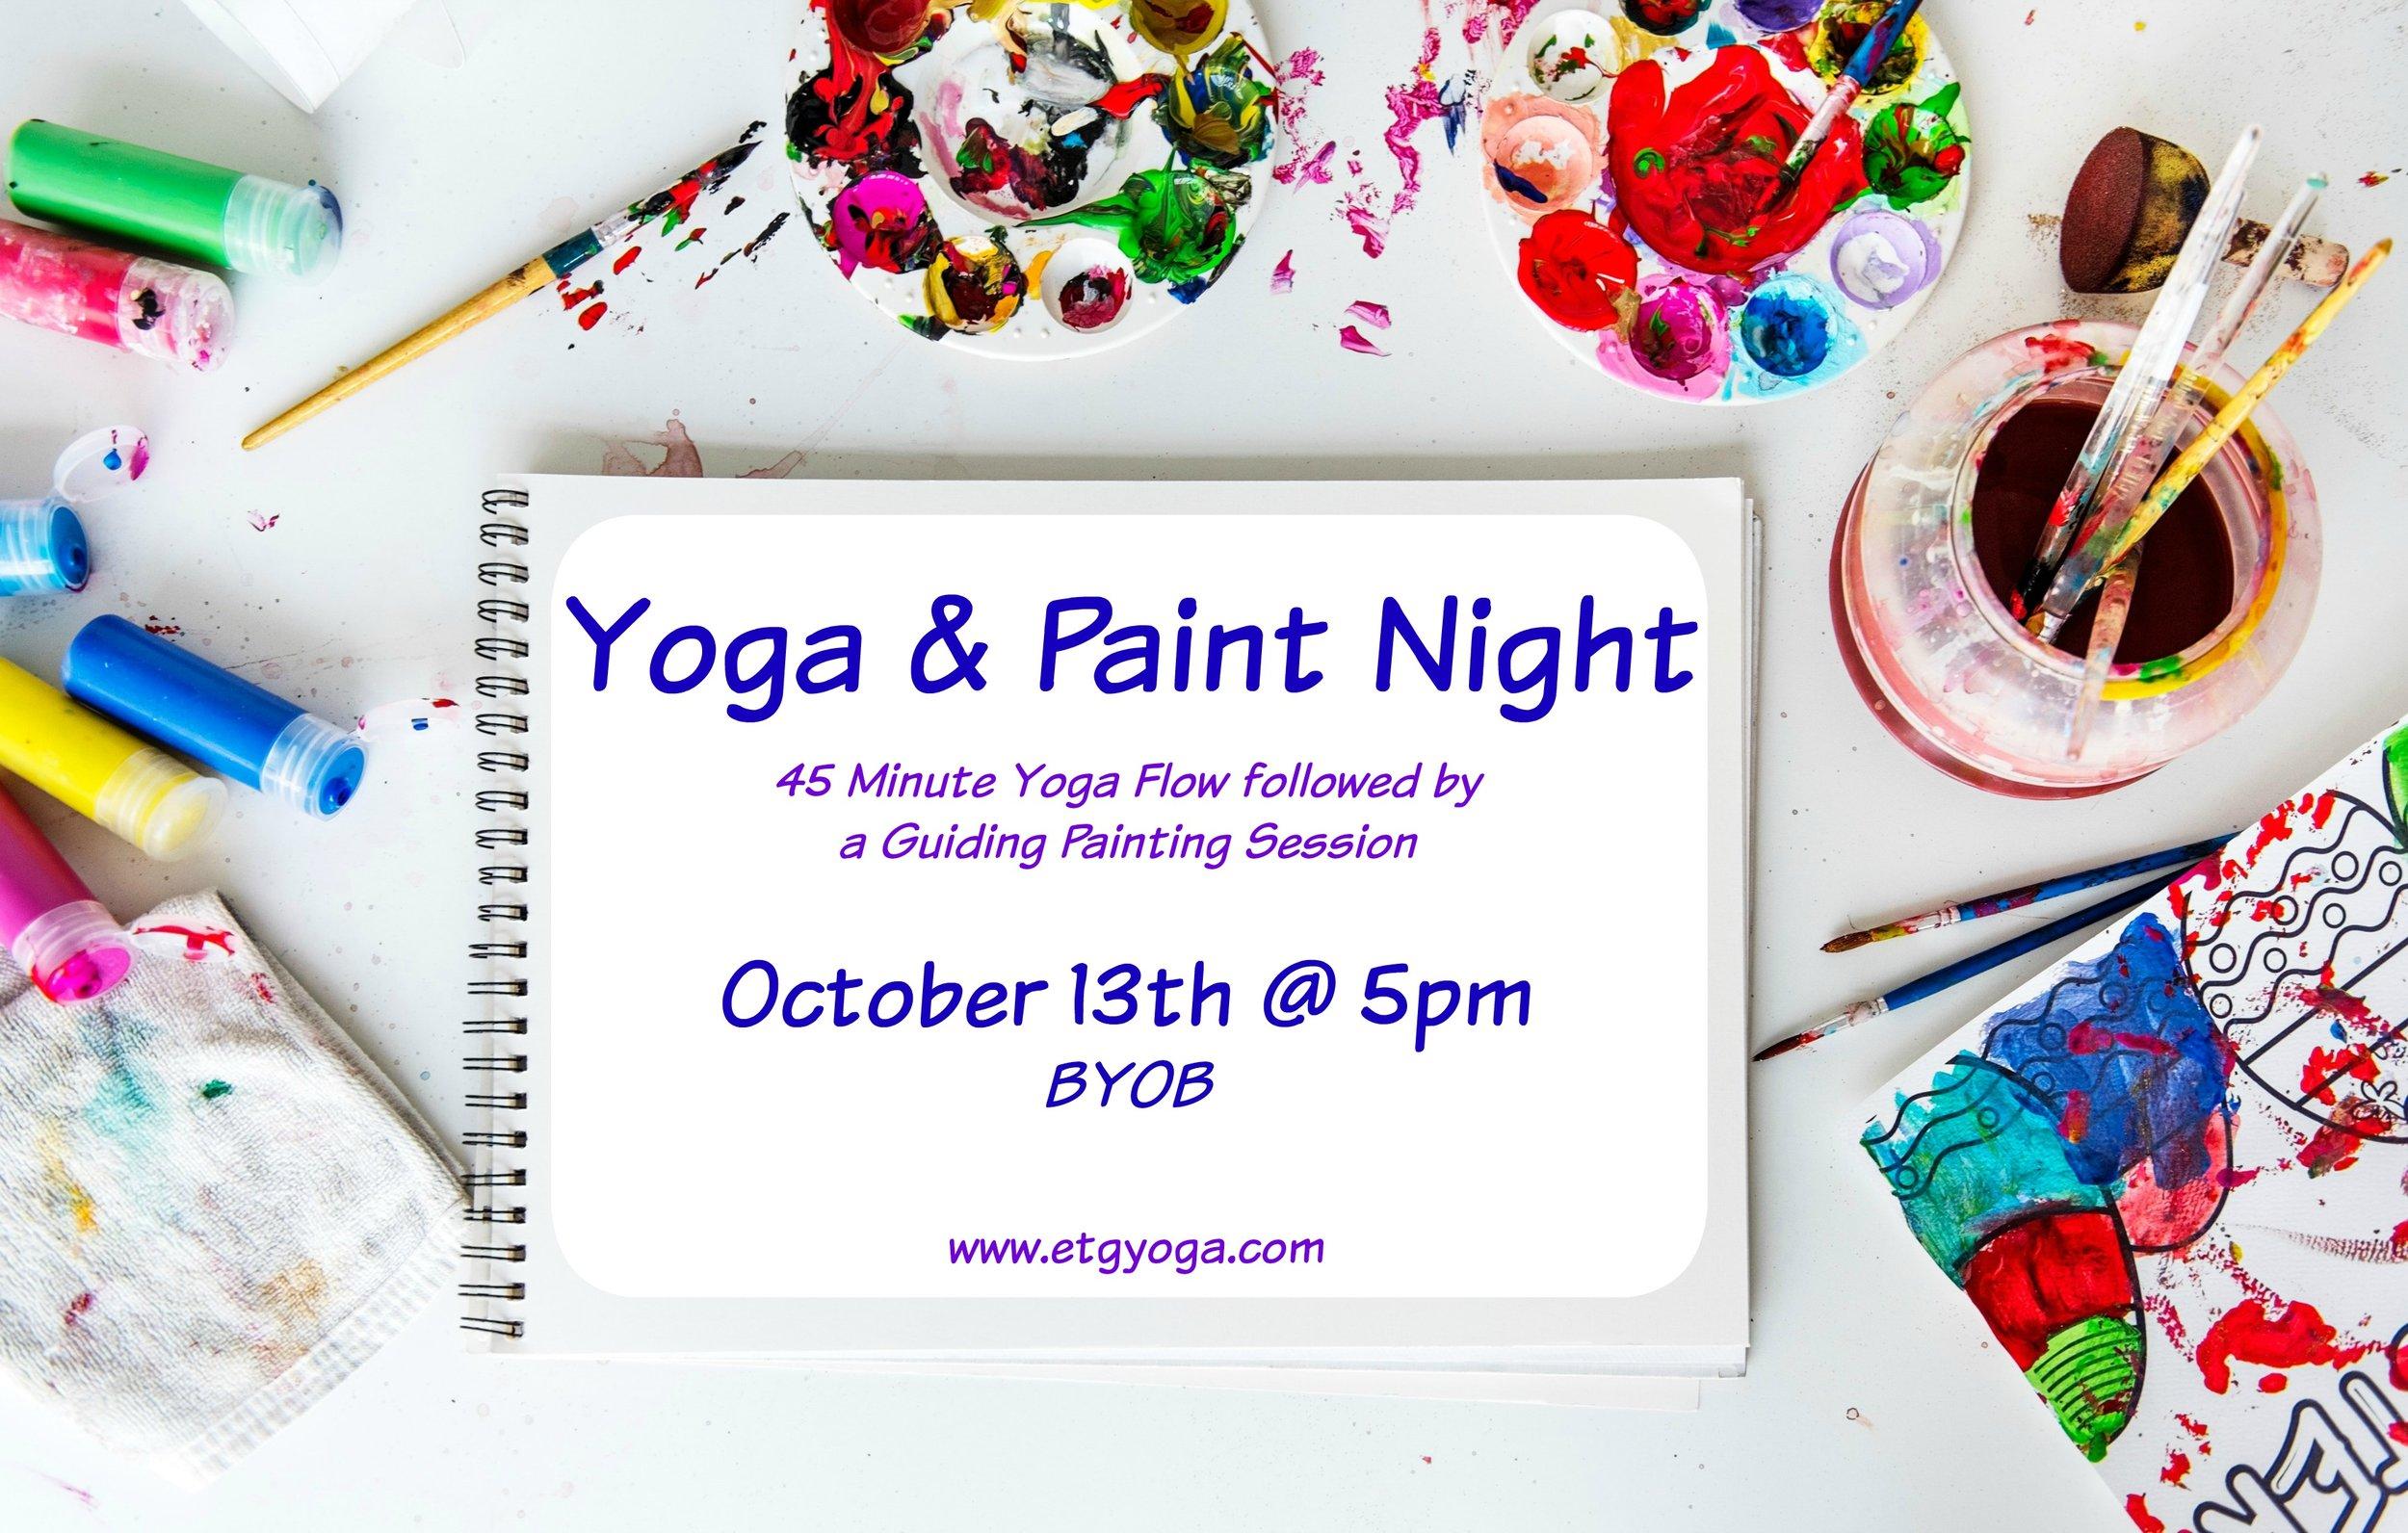 Yoga & Paint Night Oct 13th.jpg